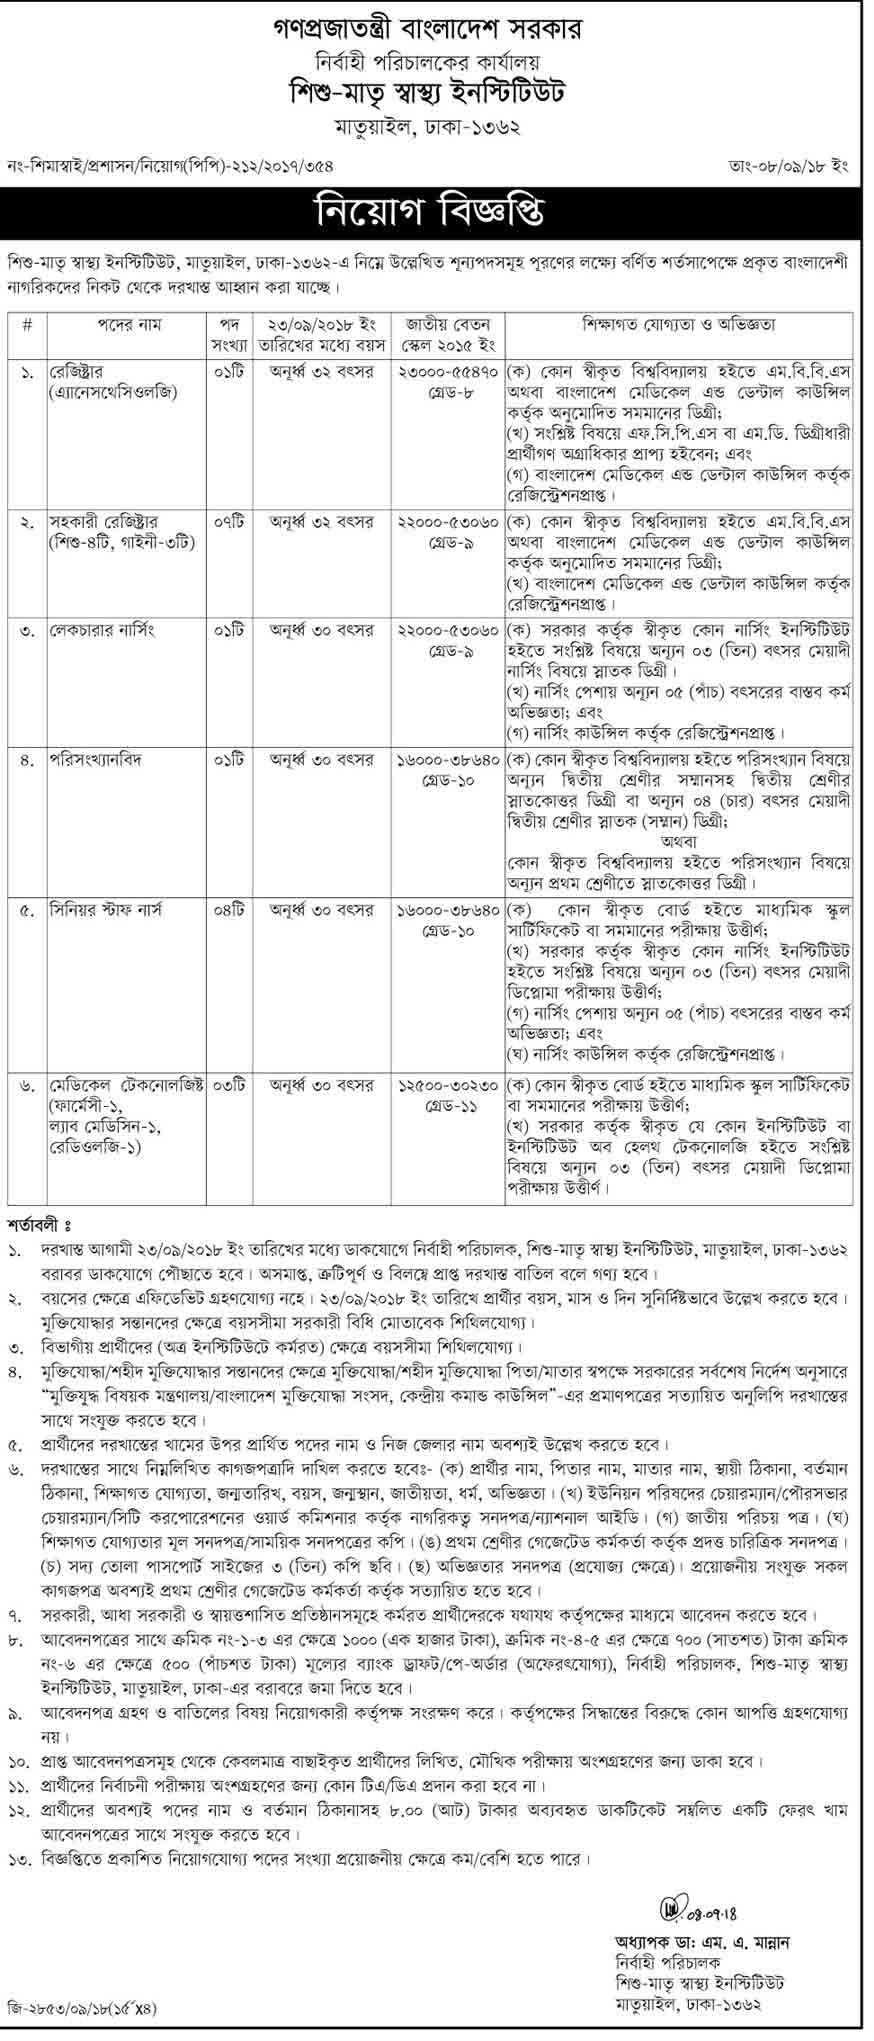 Child-Mother-Health-Institute-Job-Circular-2018